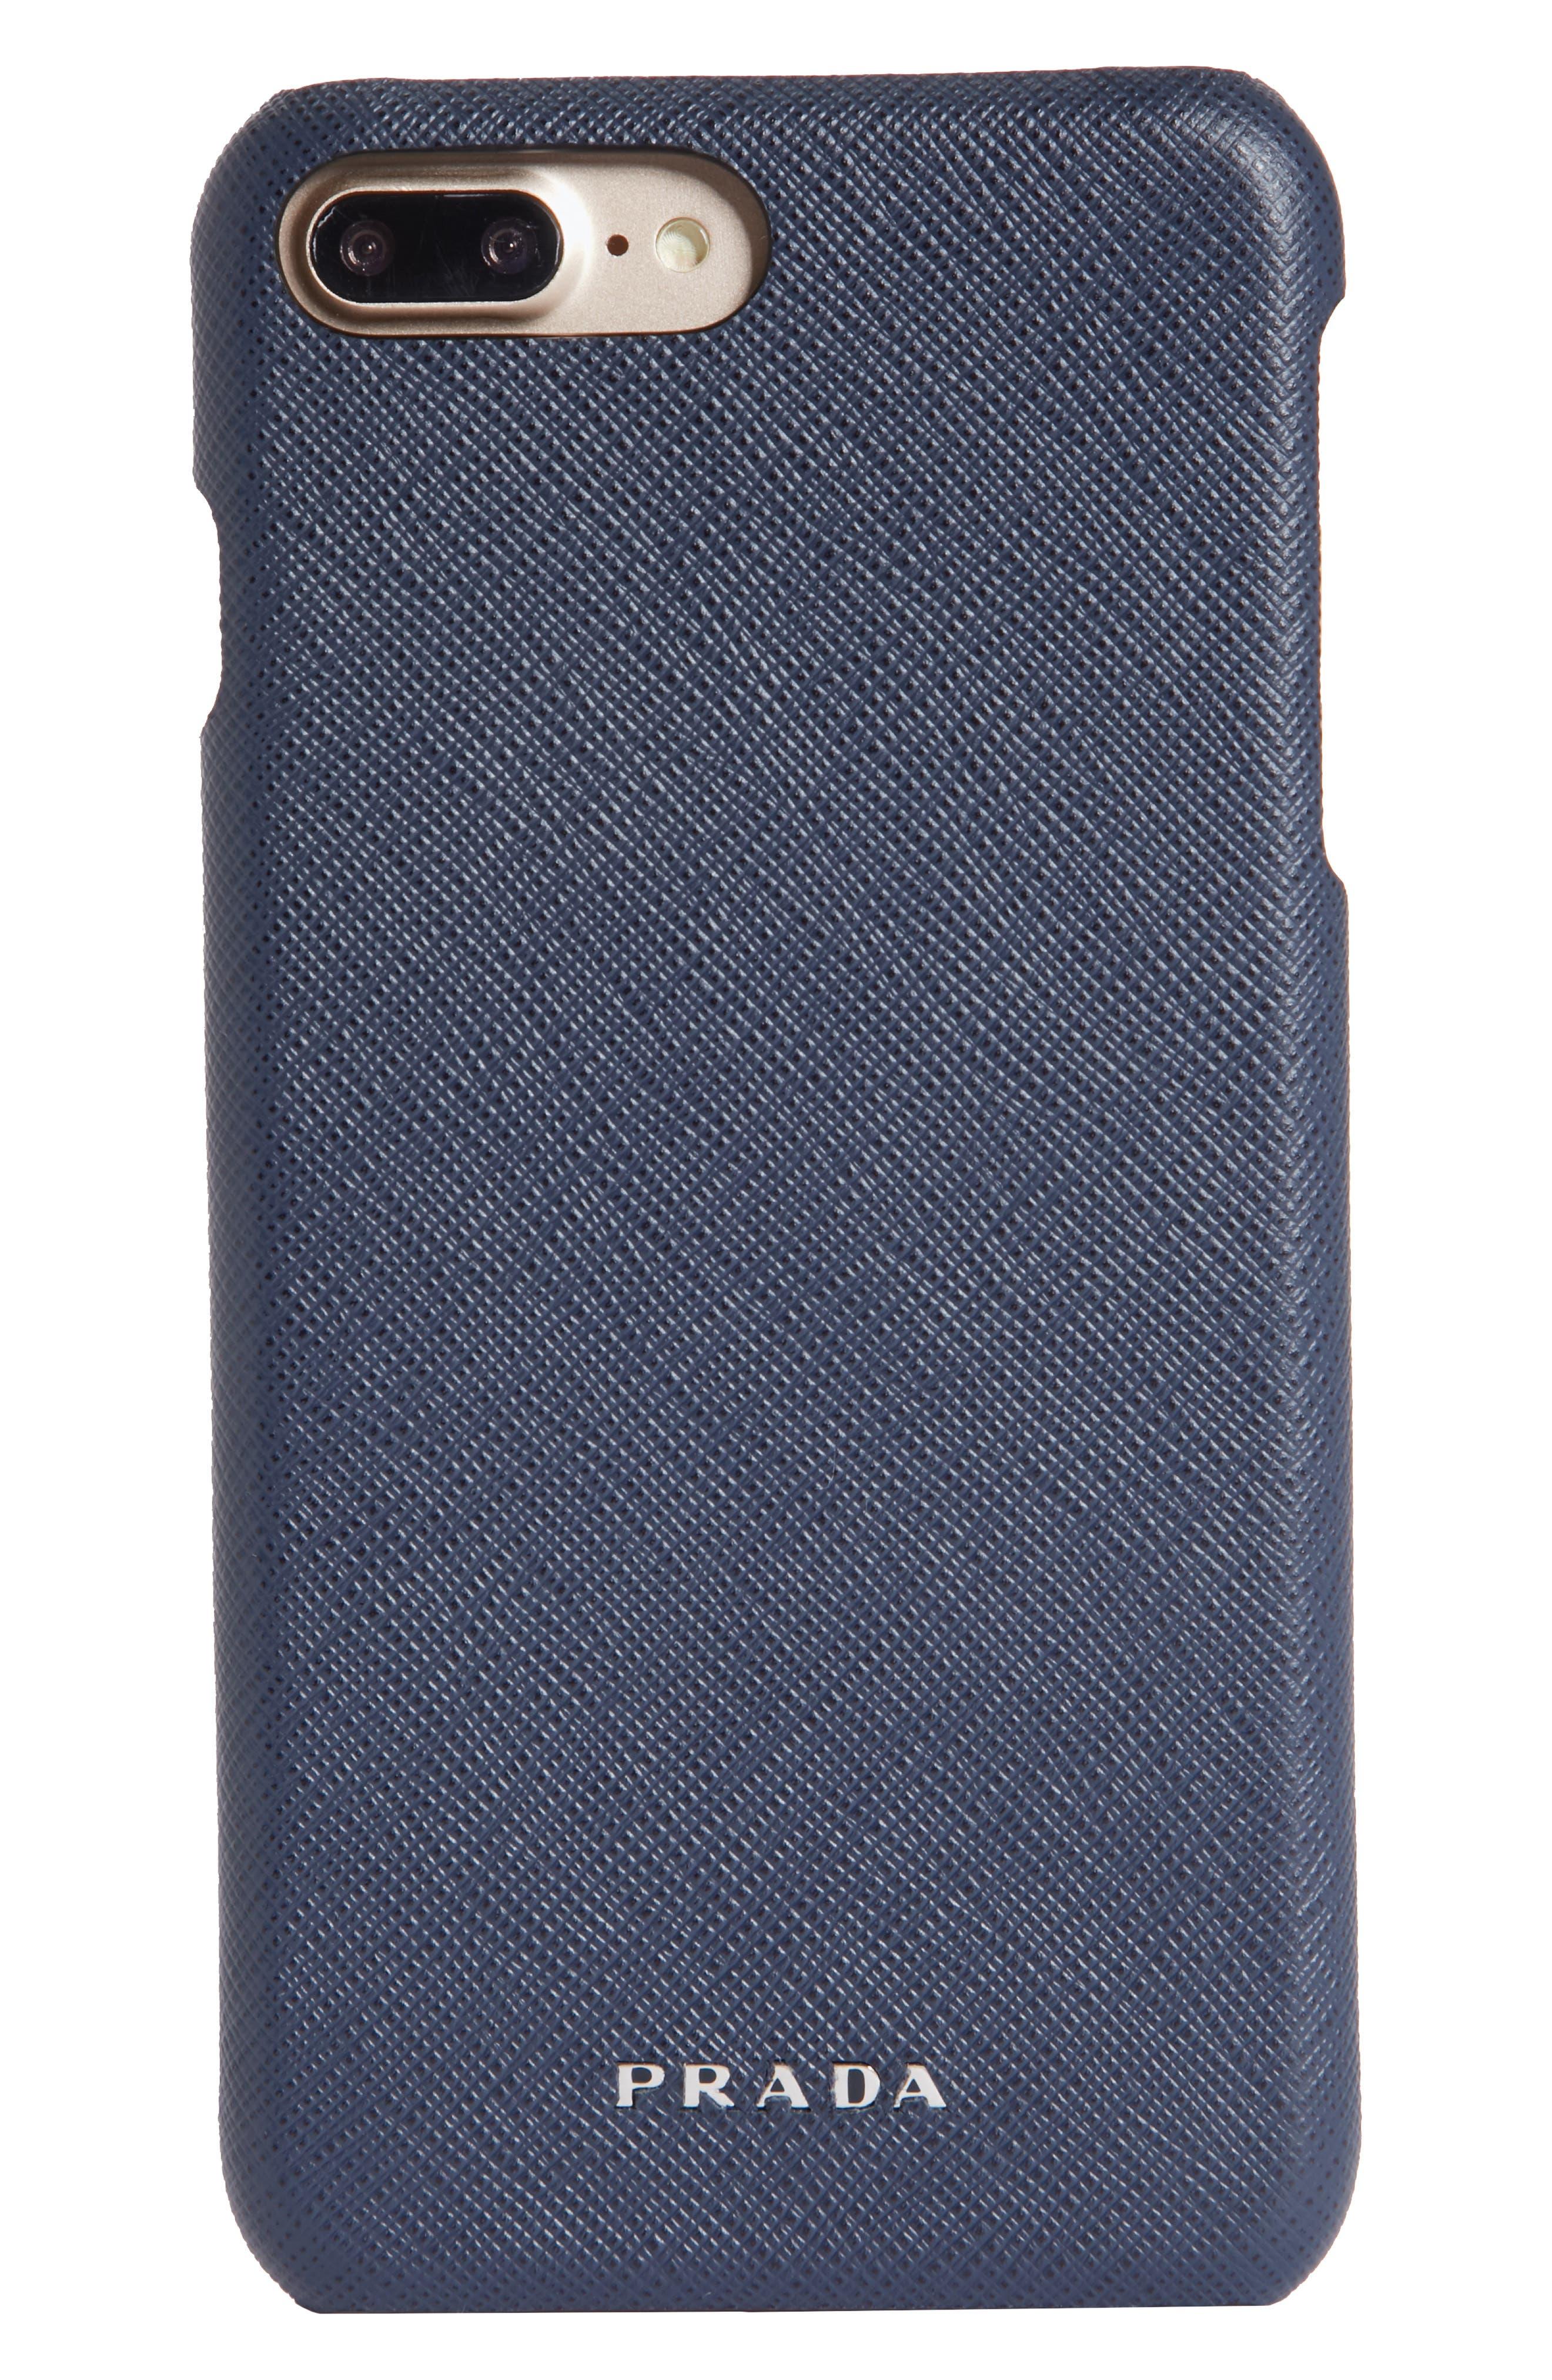 Saffiano Leather iPhone 8 Case,                             Main thumbnail 1, color,                             BALTICO